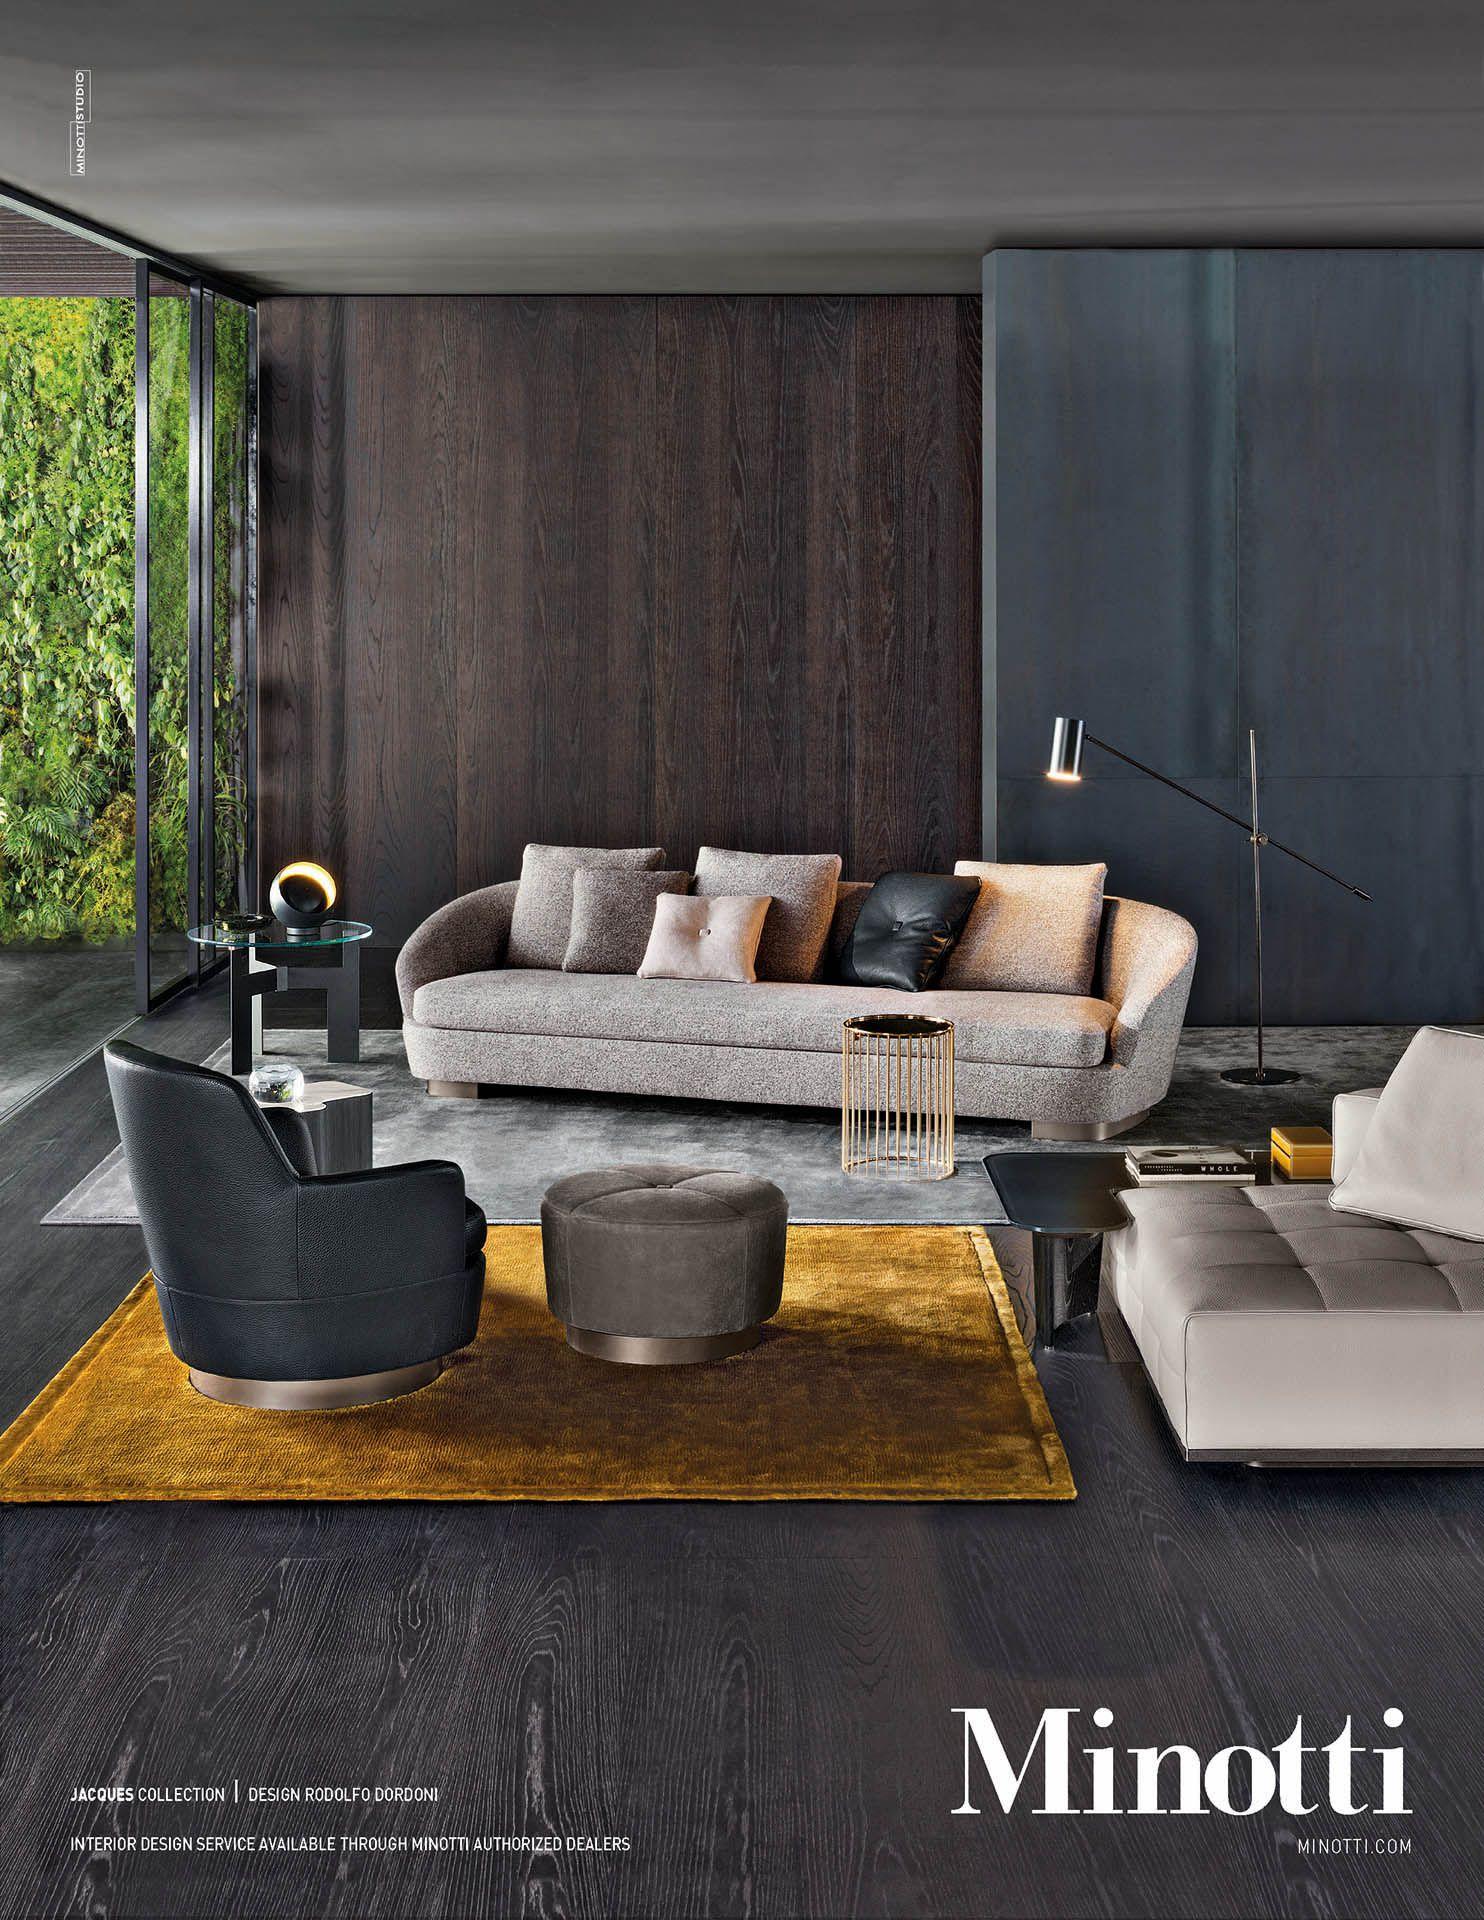 Jacques collection, Rodolfo Dordoni Design #adv #jacques